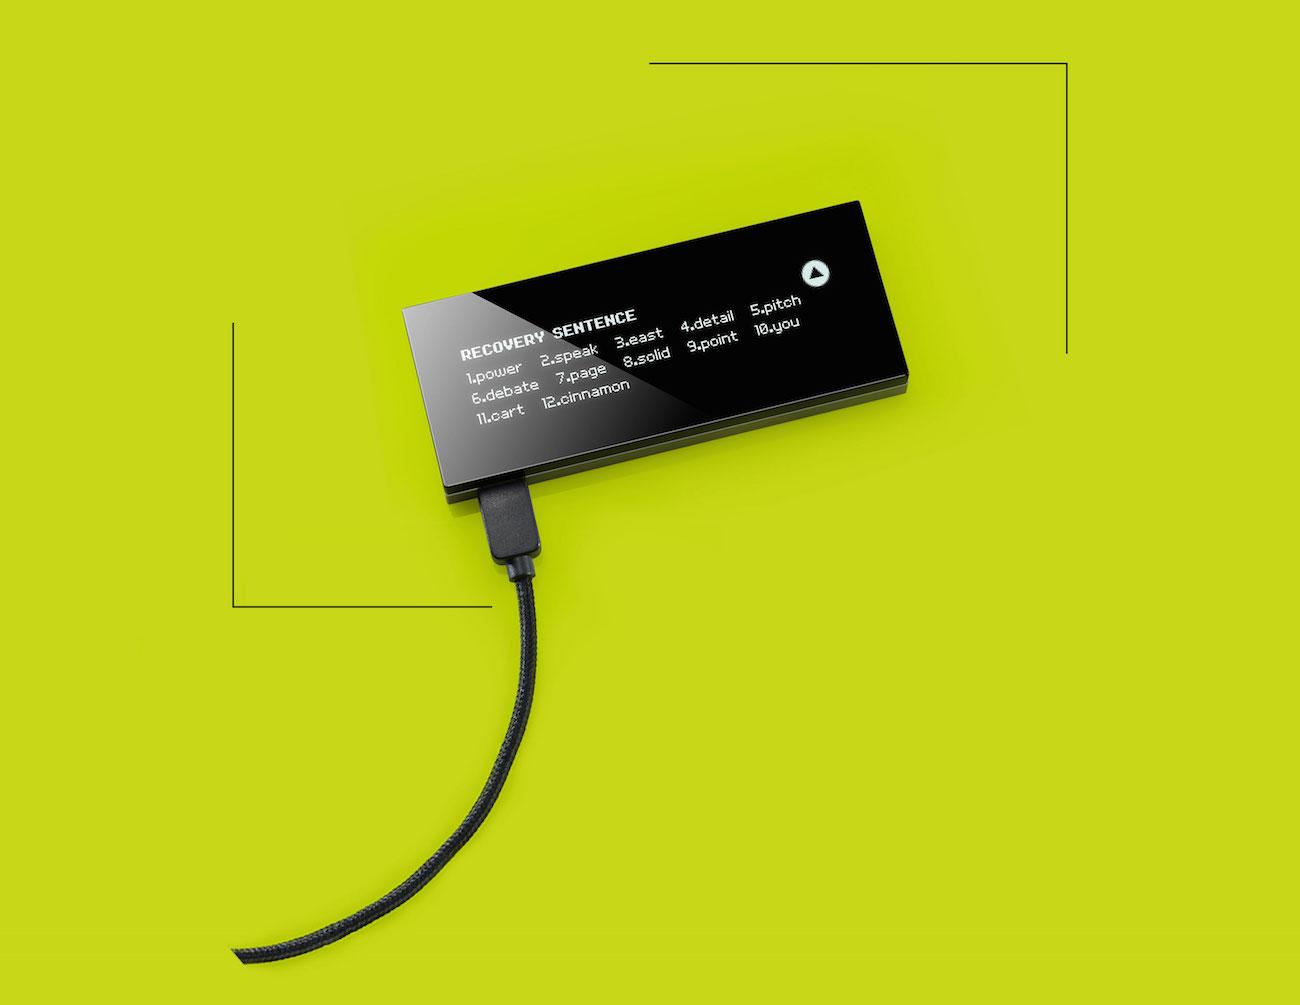 Hardware Wallet Bitcoin